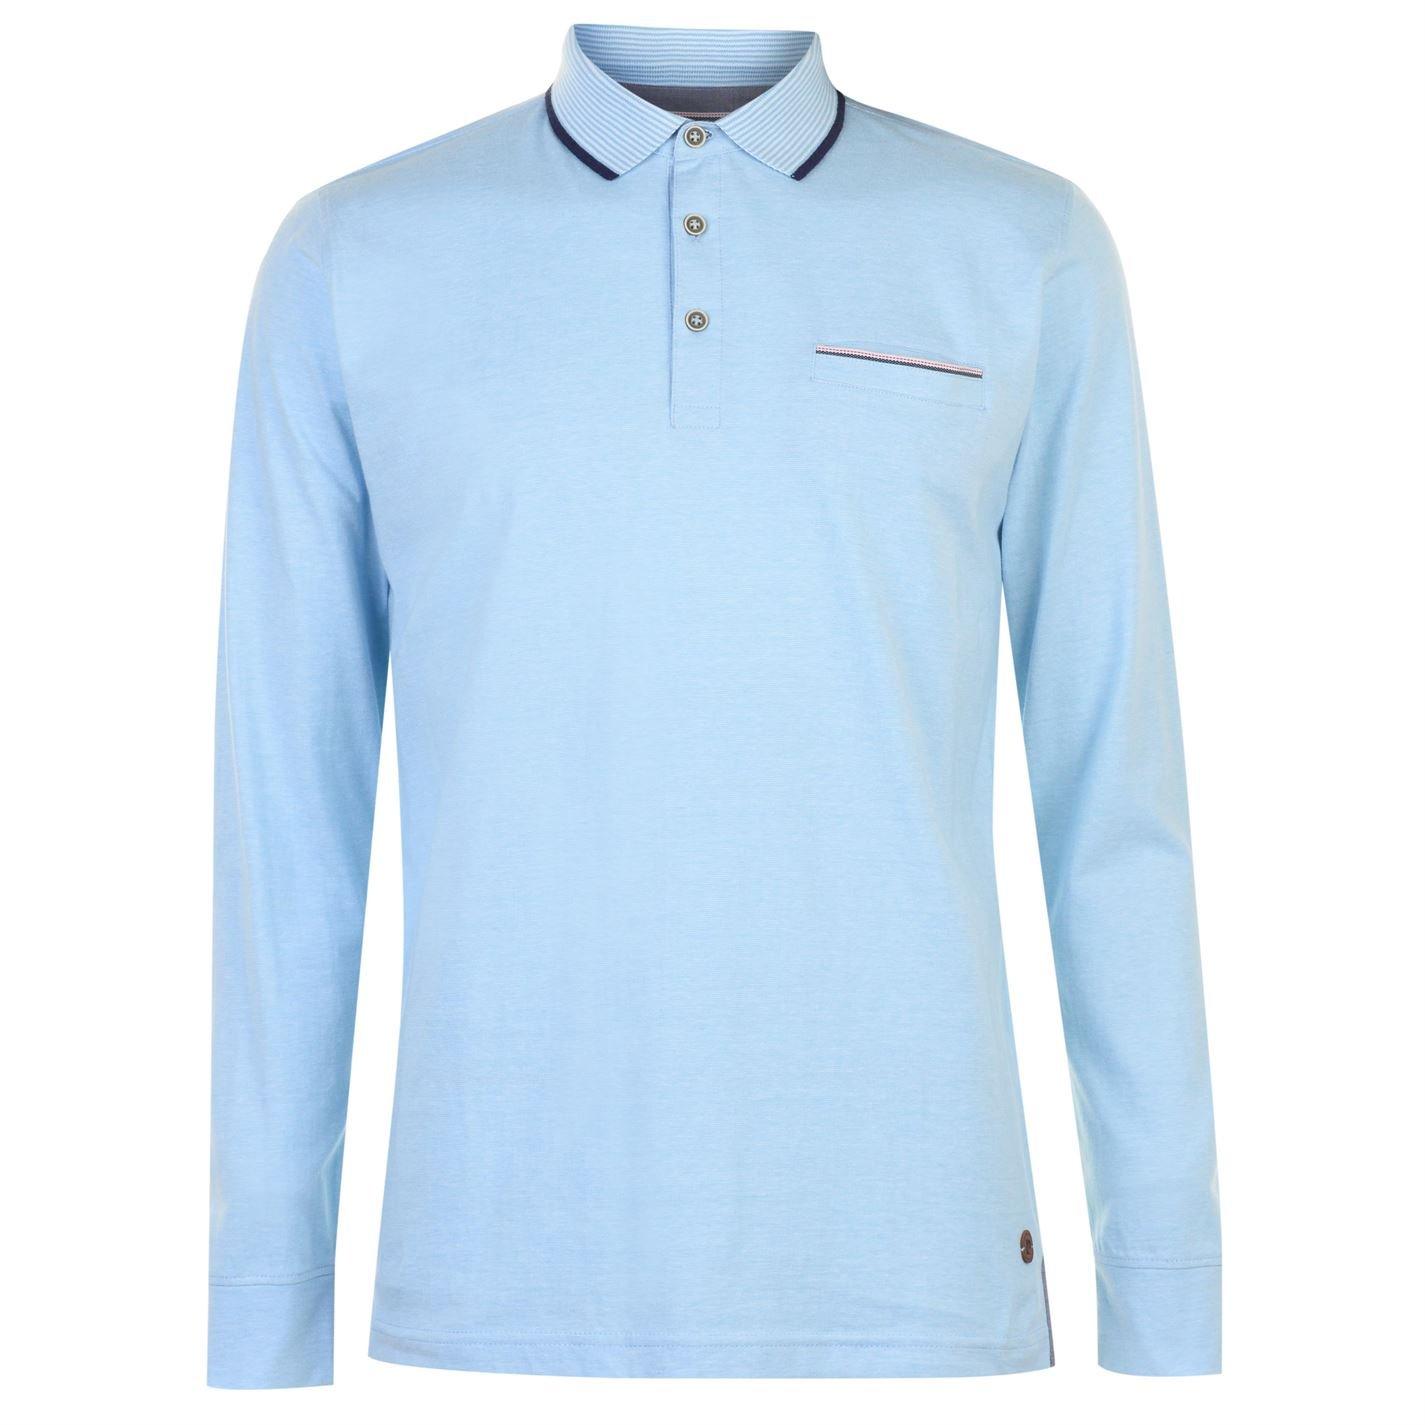 Pierre Cardin Hombre Yarn Dye Camisa Polo Manga Larga Sky/Blanco L ...